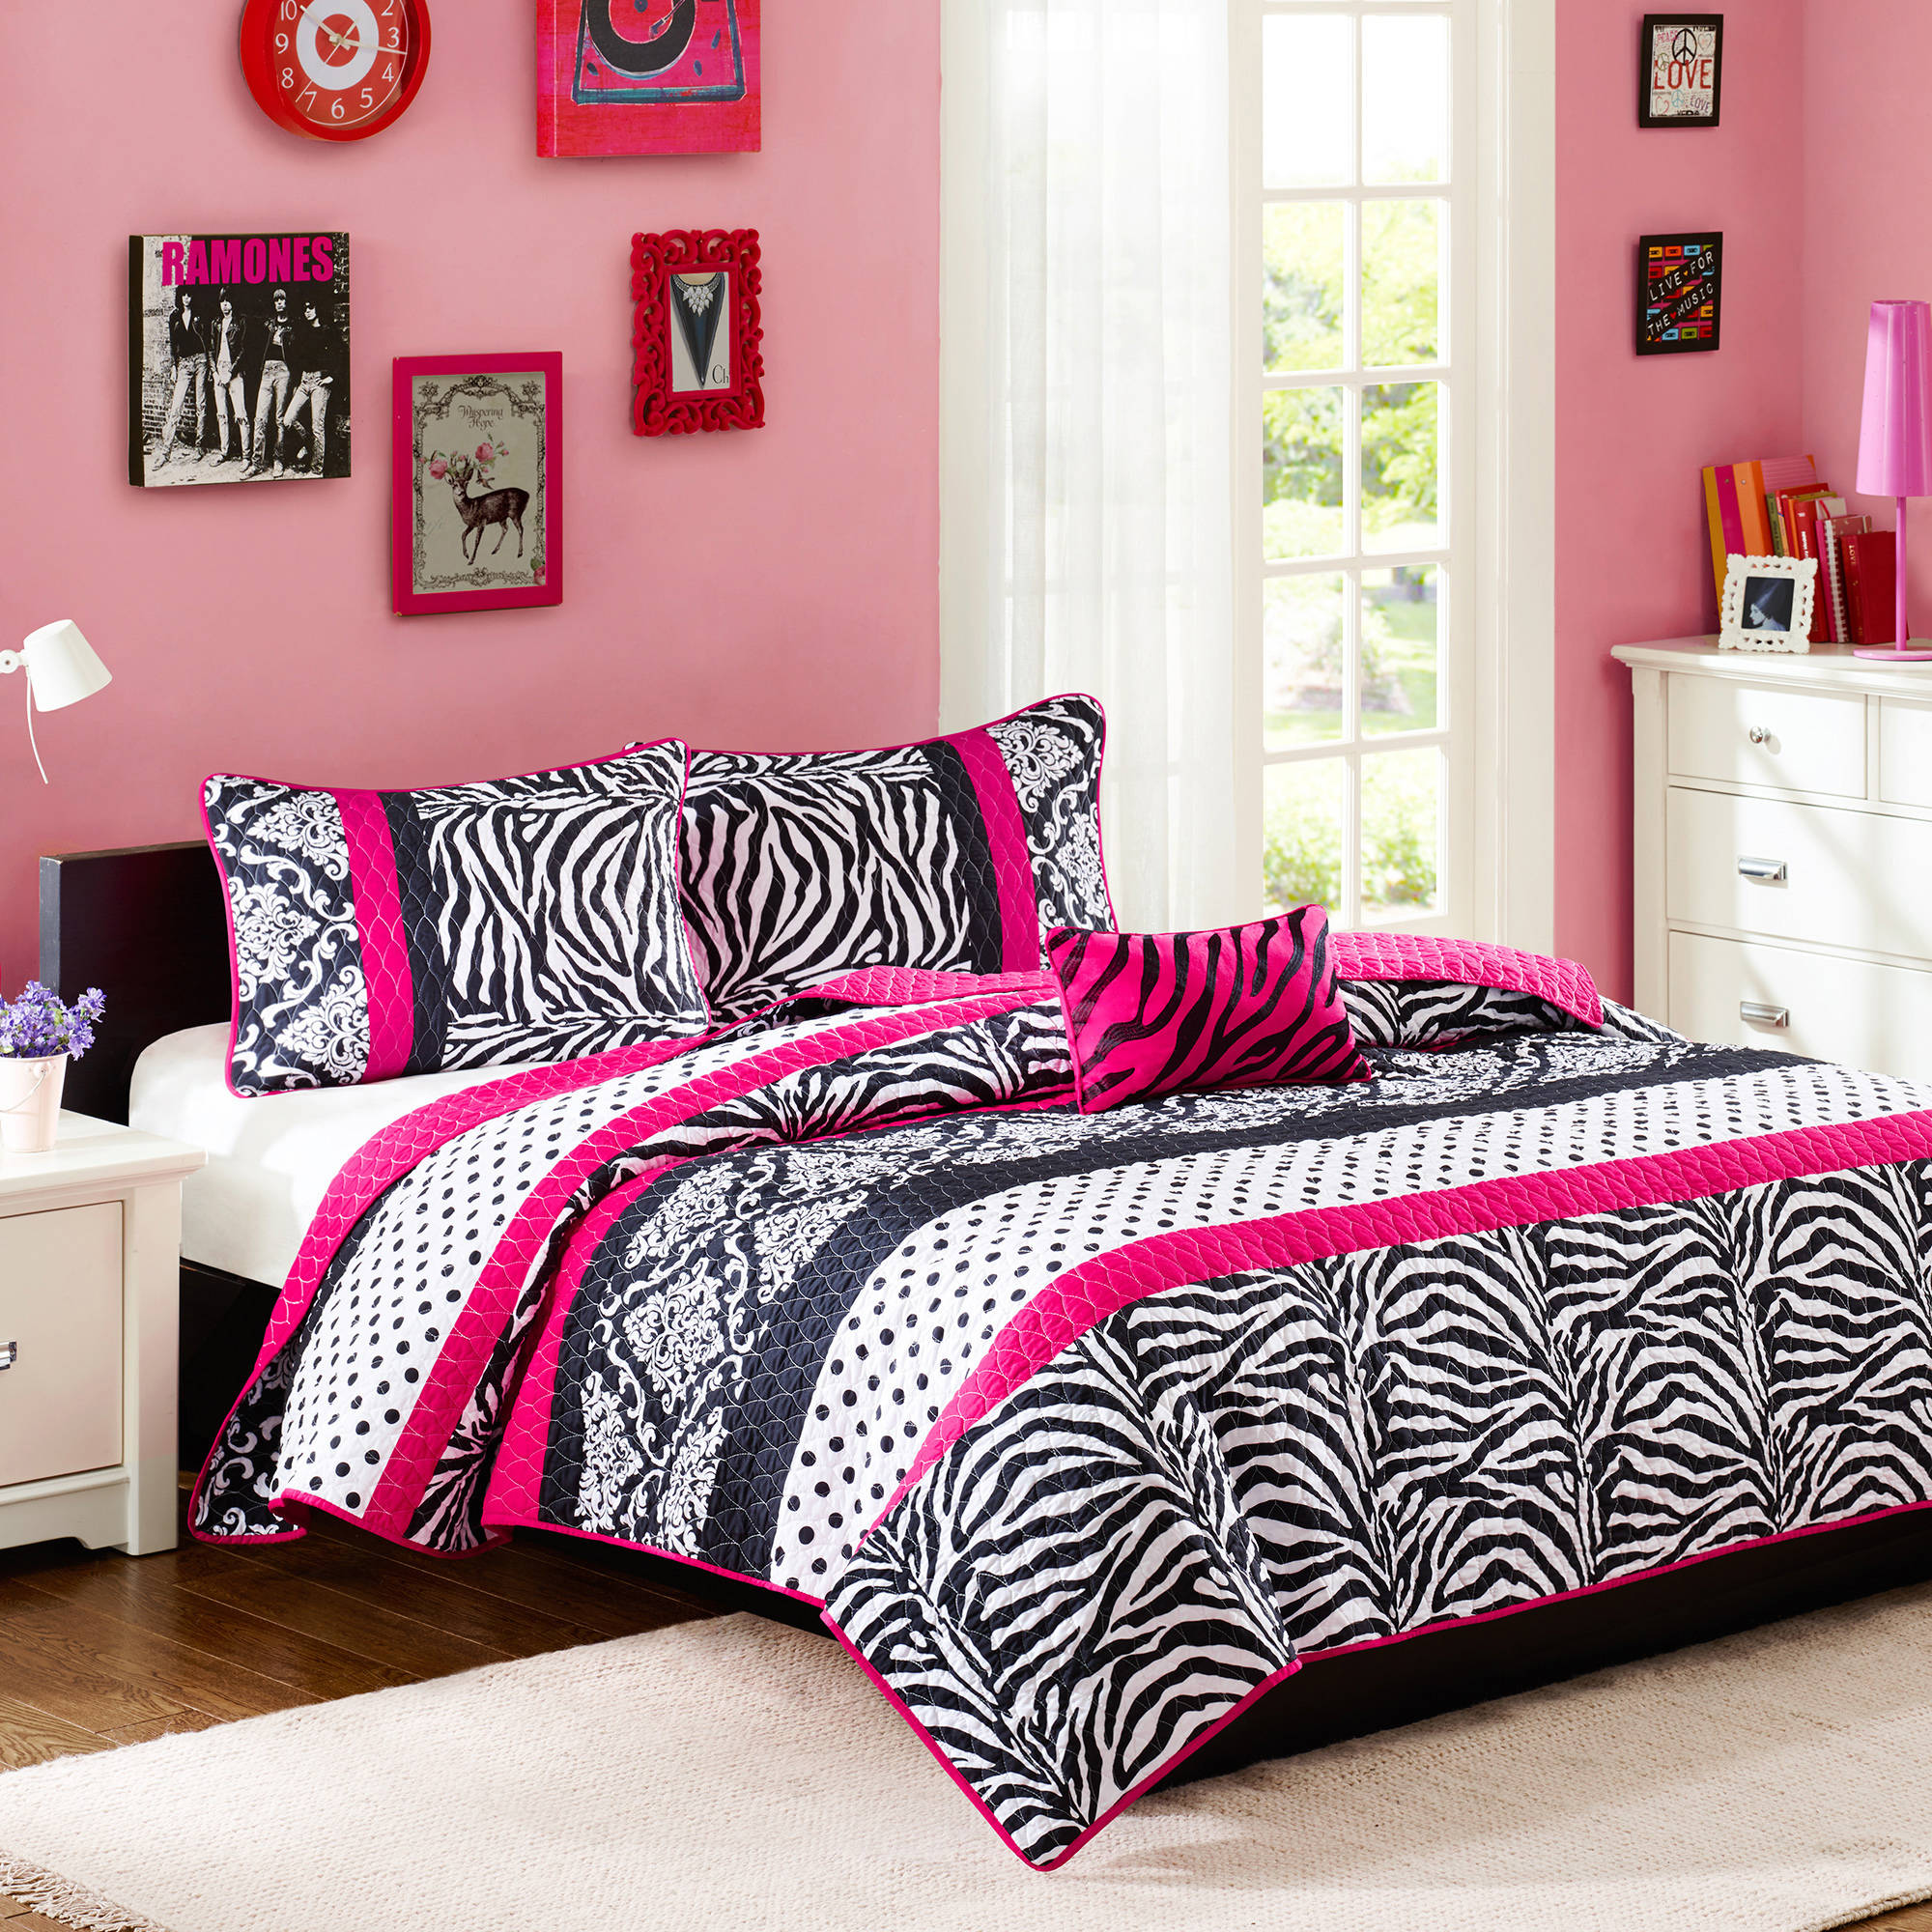 Home Essence Teen Leona Printed Coverlet Bedding Set